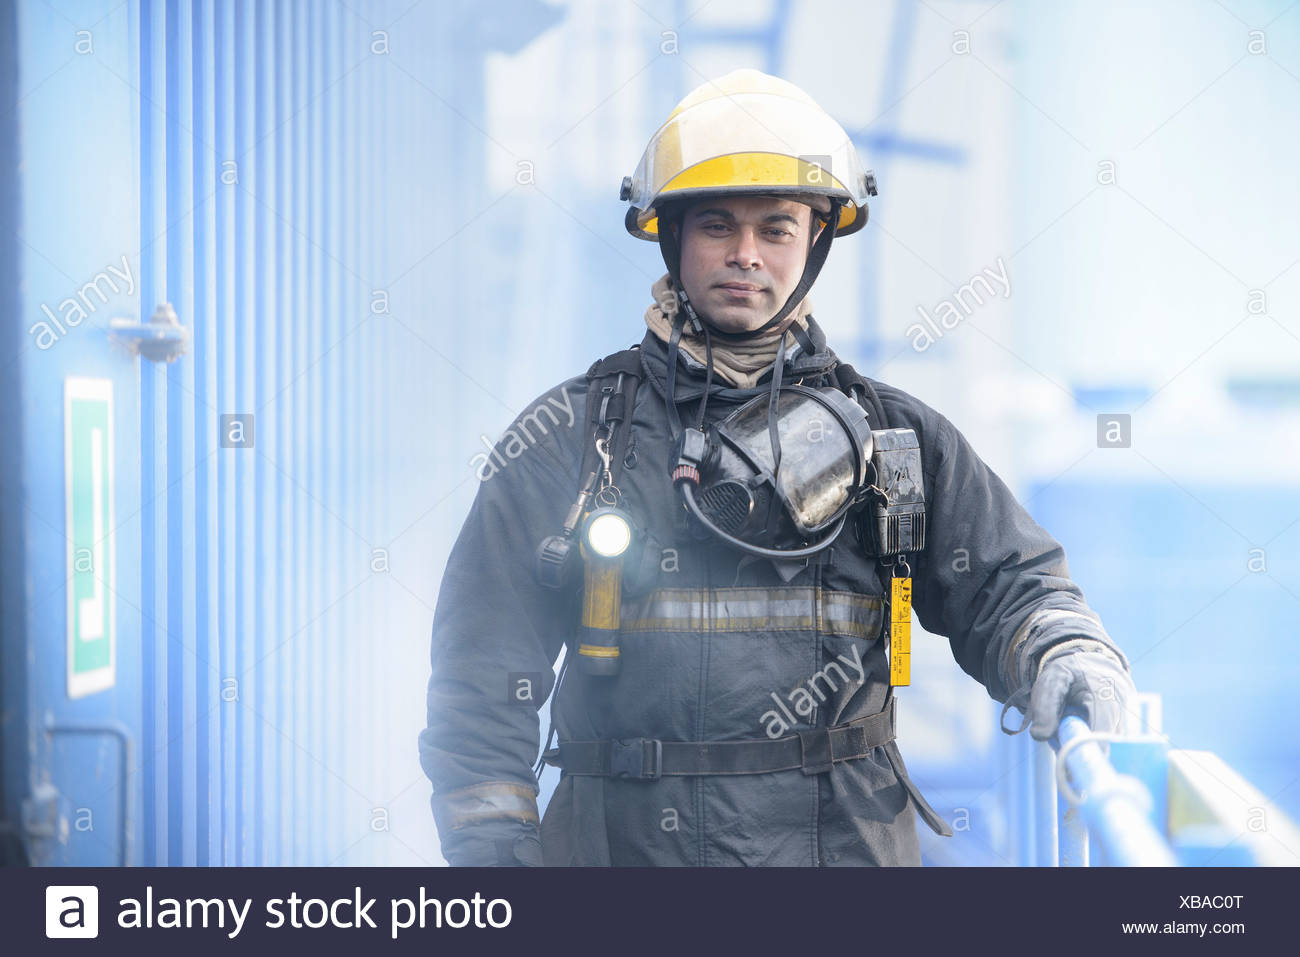 Firefighter standing on platform - Stock Image